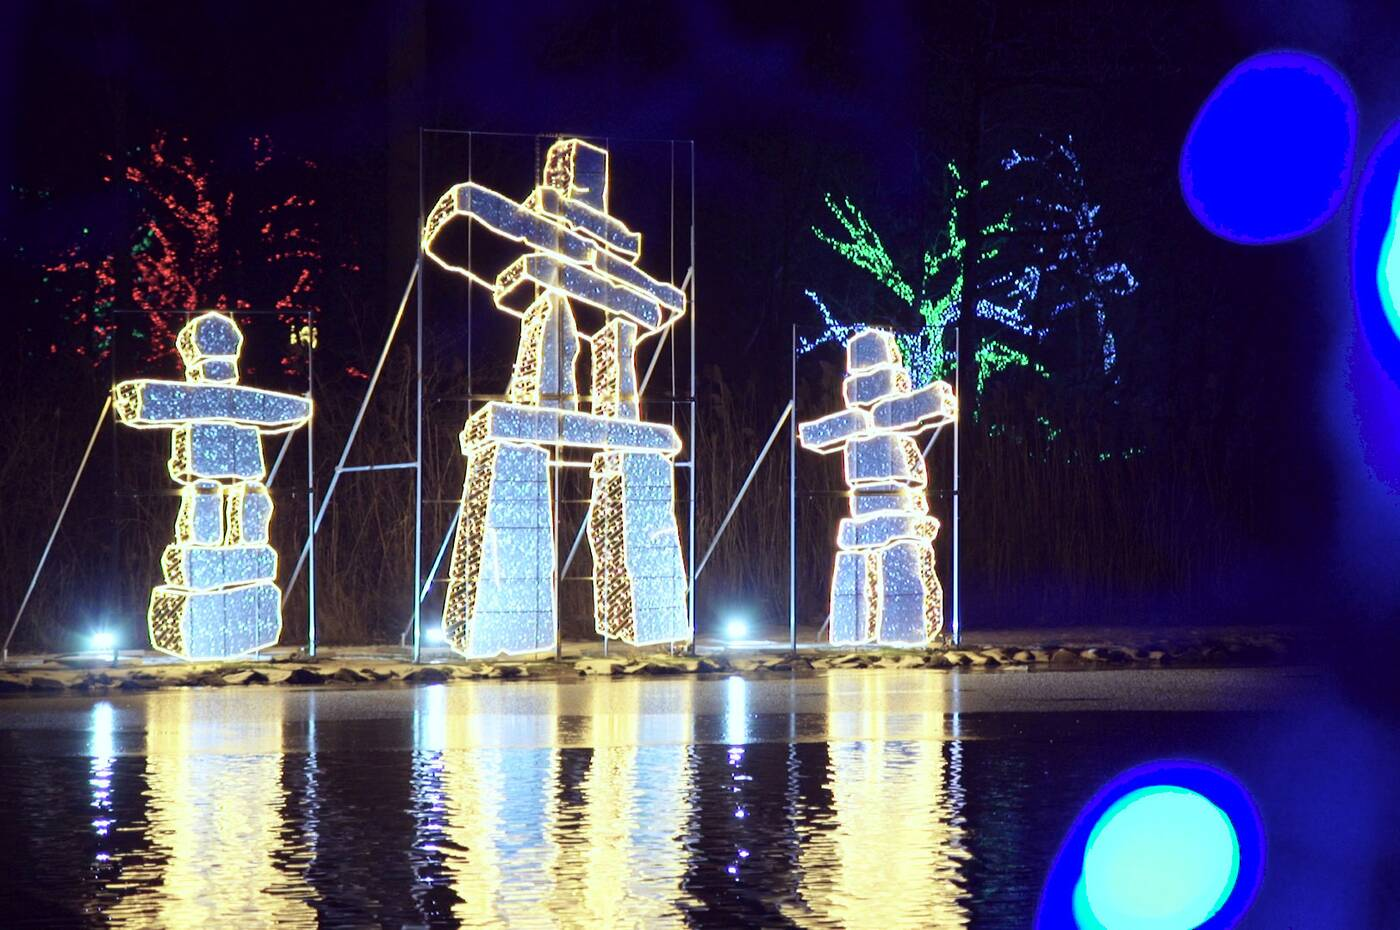 niagara festival of lights